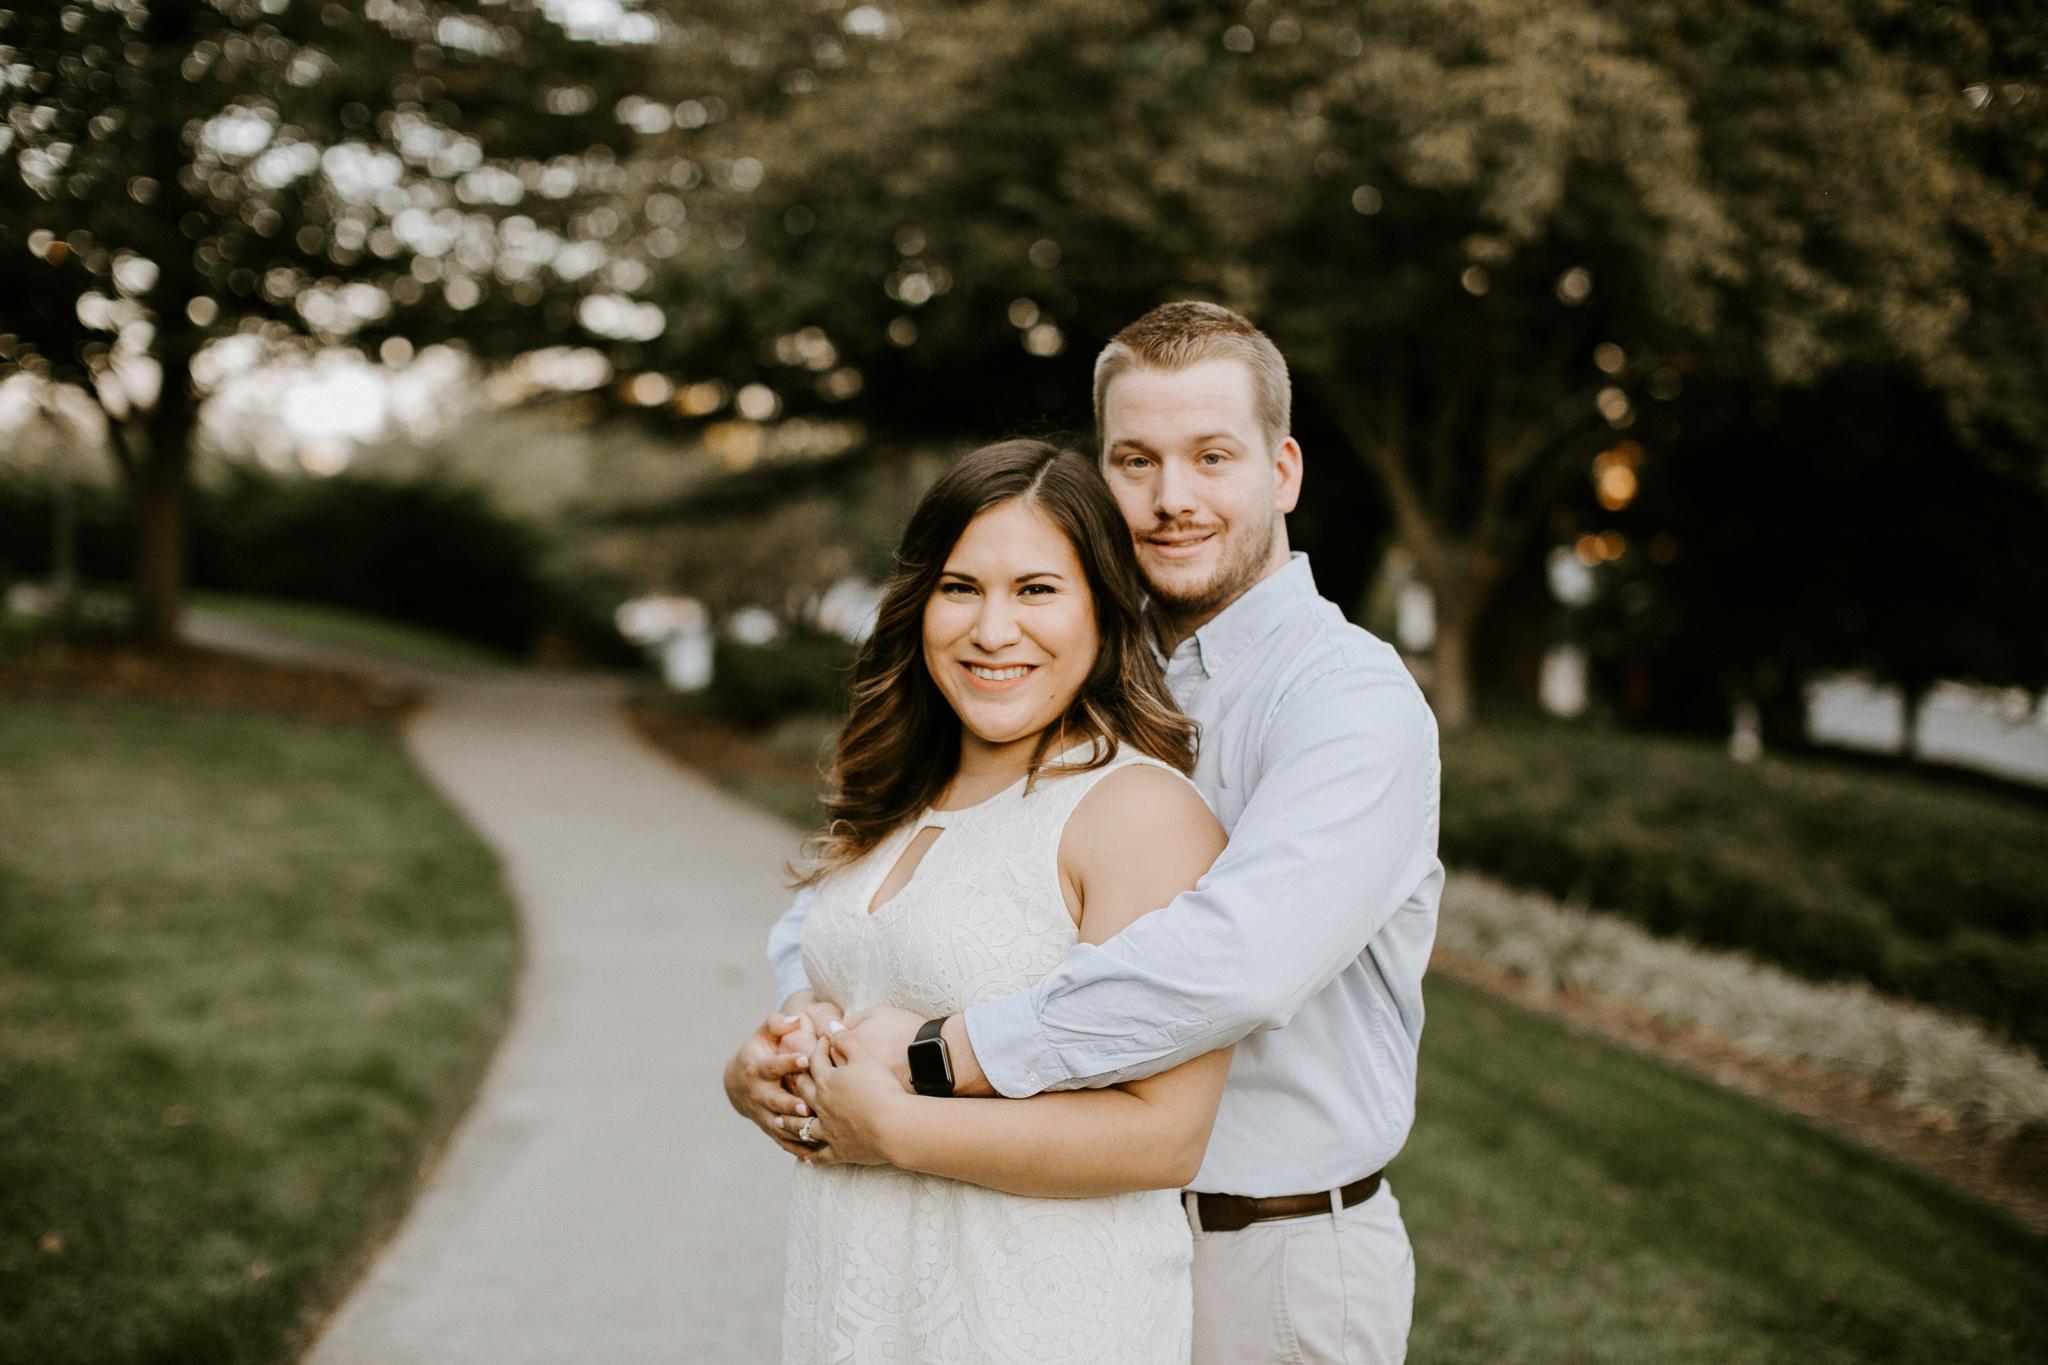 Engagement - Downtown Roanoke -  Wedding Photographer - Virginia - Best - Pat Cori Photography-24.jpg